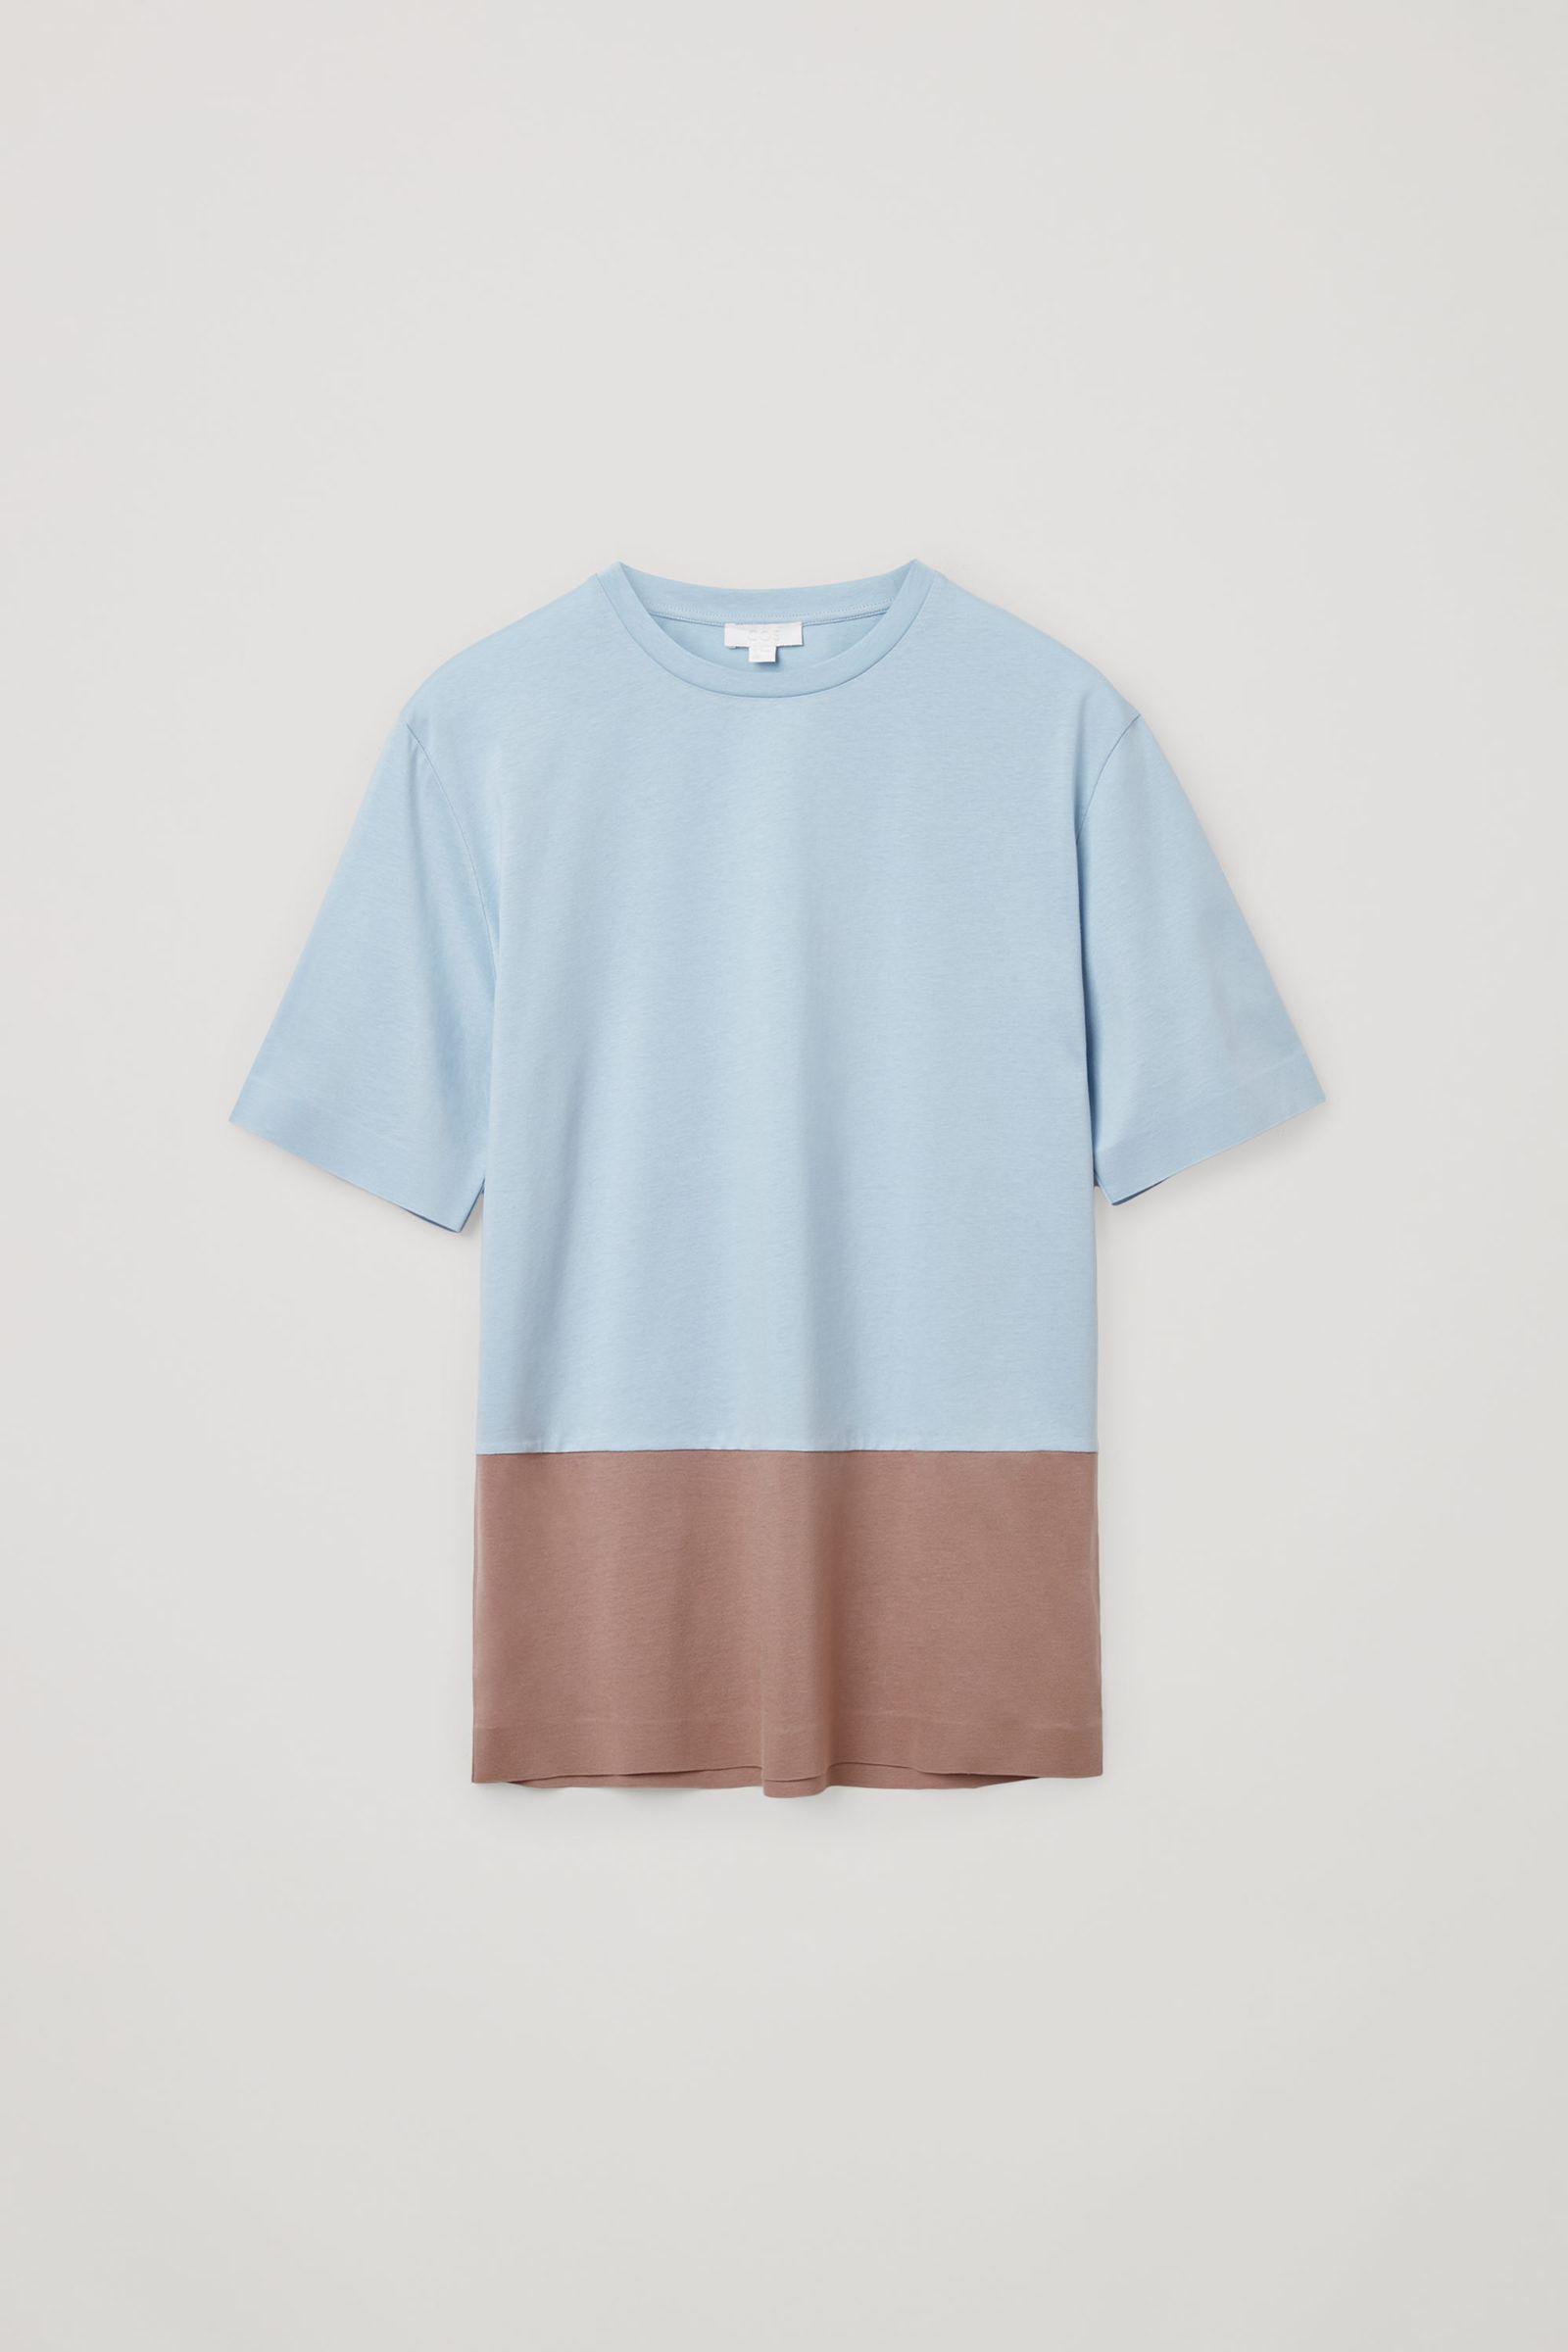 COS 본디드 코튼 티셔츠의 라이트 블루 / 브라운컬러 Product입니다.